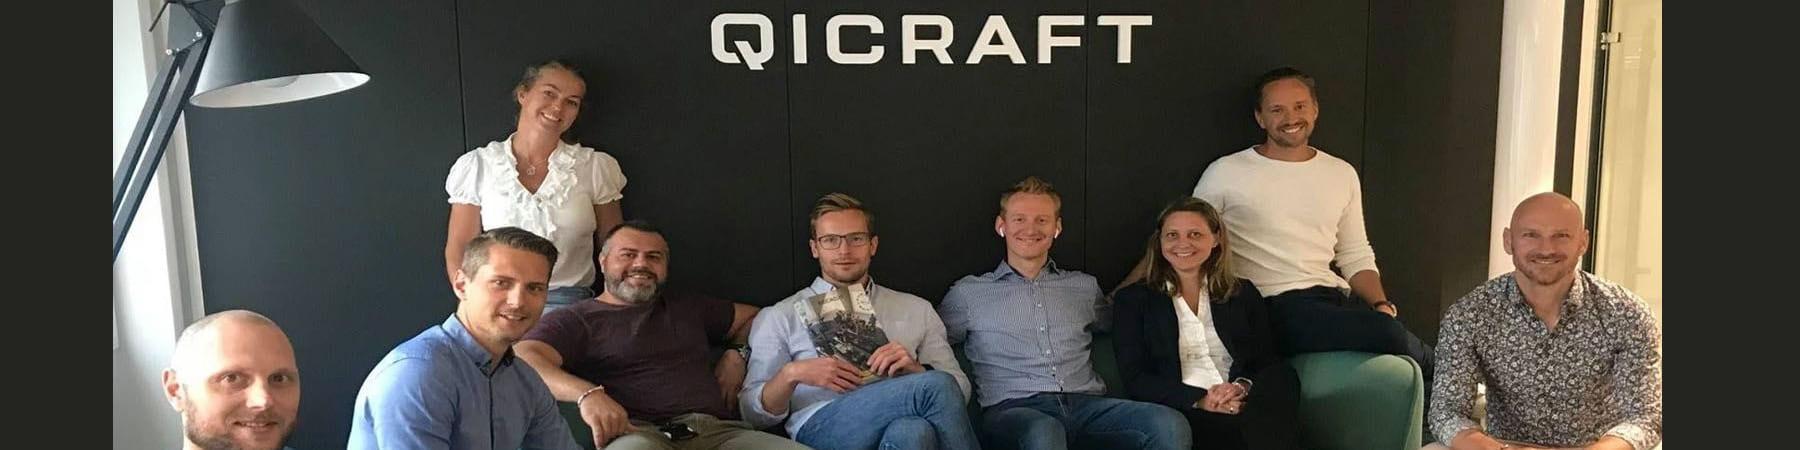 Om Qicraft / Technogym